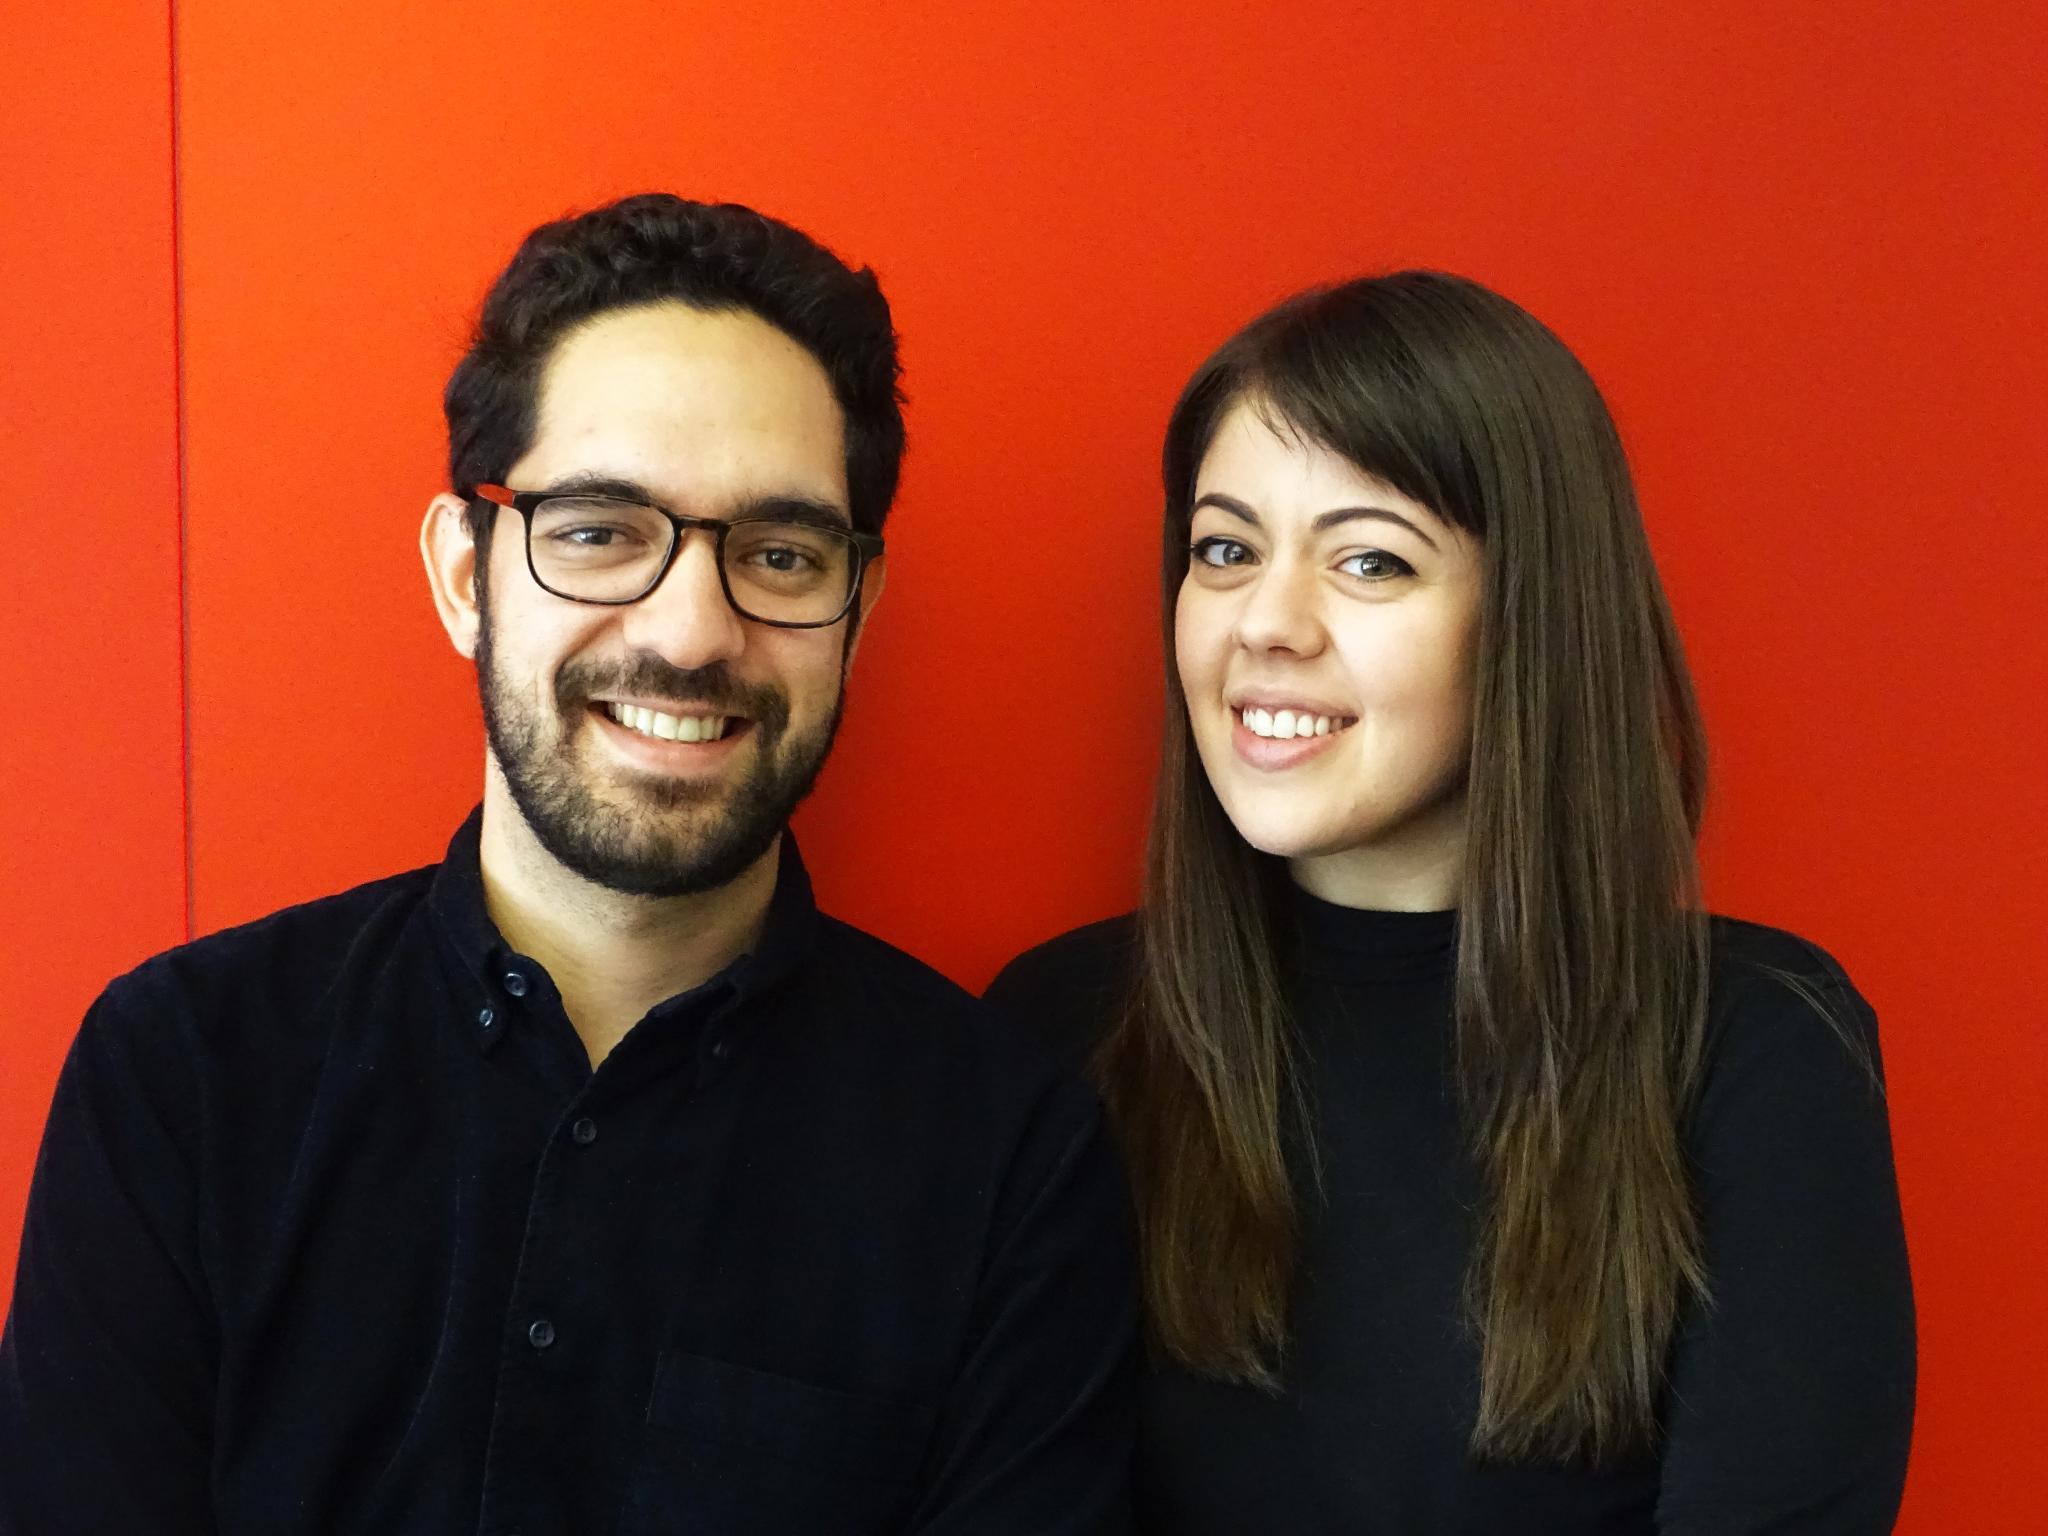 Meet Josè Ripol + Samantha Salzano, two unicorns recognized by @AdWeek for the #Creative100! https://t.co/EVHhKqPx9x https://t.co/kRAgC2Yy9i